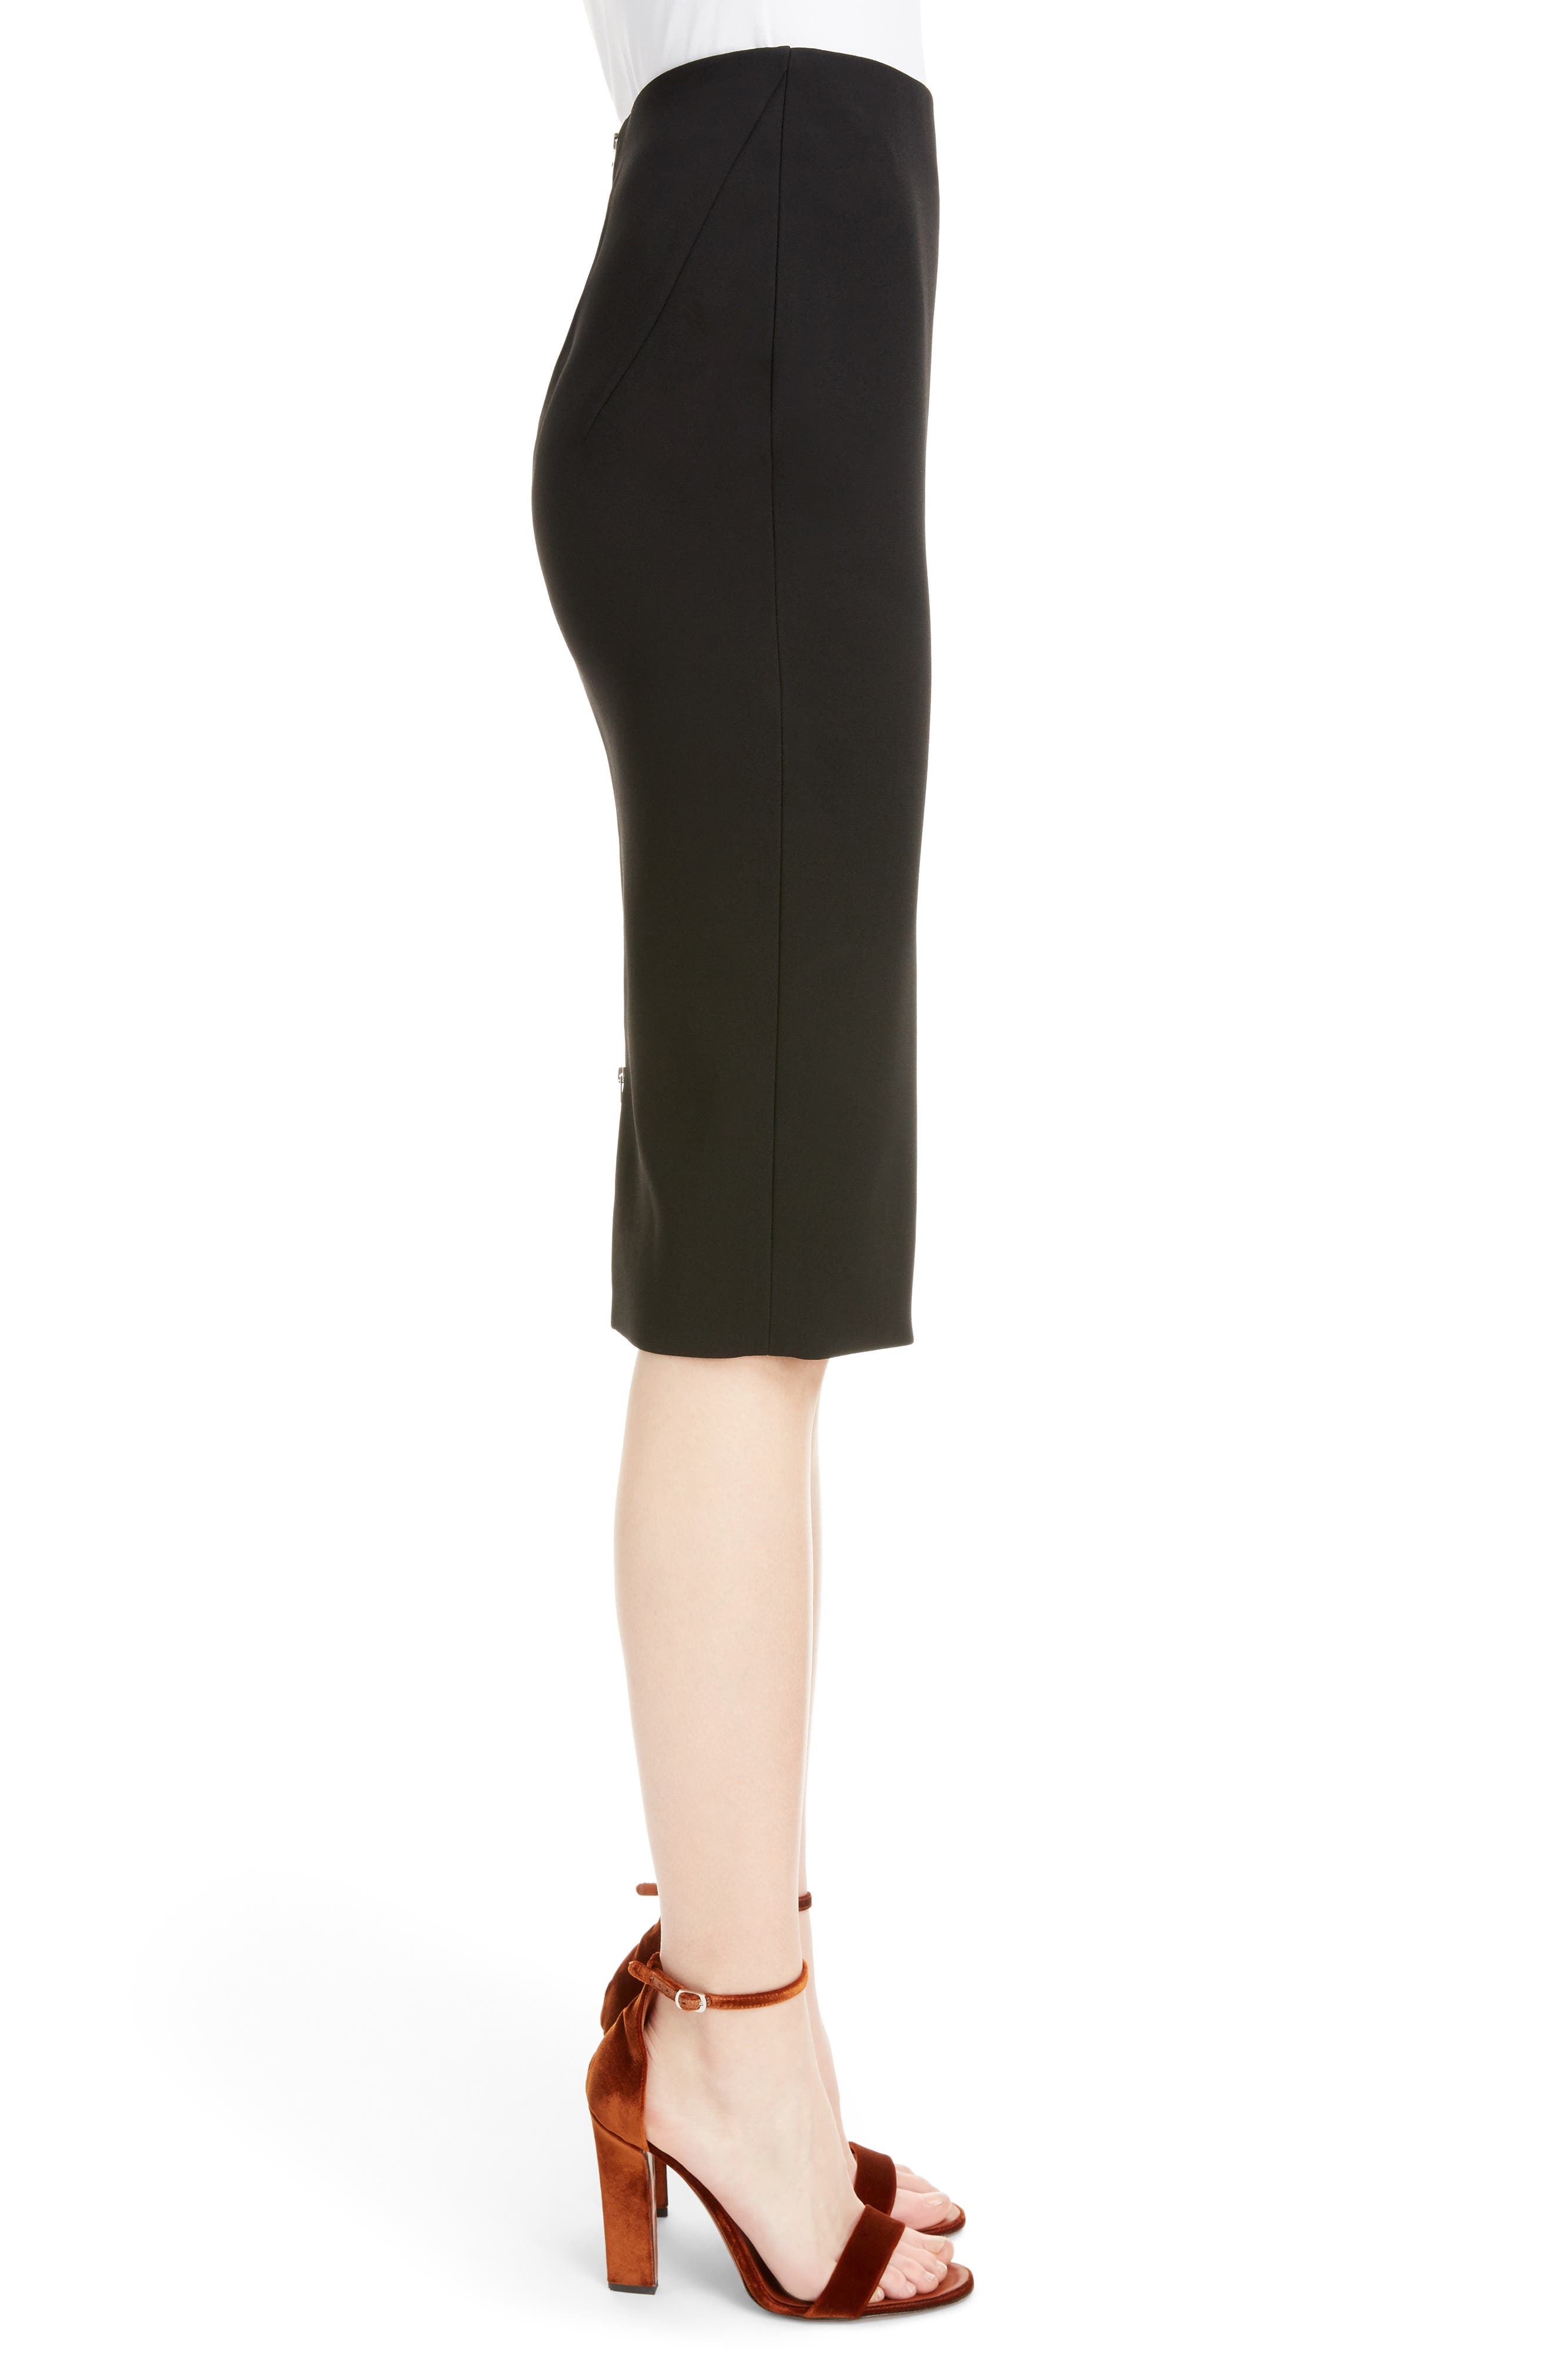 VICTORIA BECKHAM, Back Zip Pencil Skirt, Alternate thumbnail 3, color, BLACK